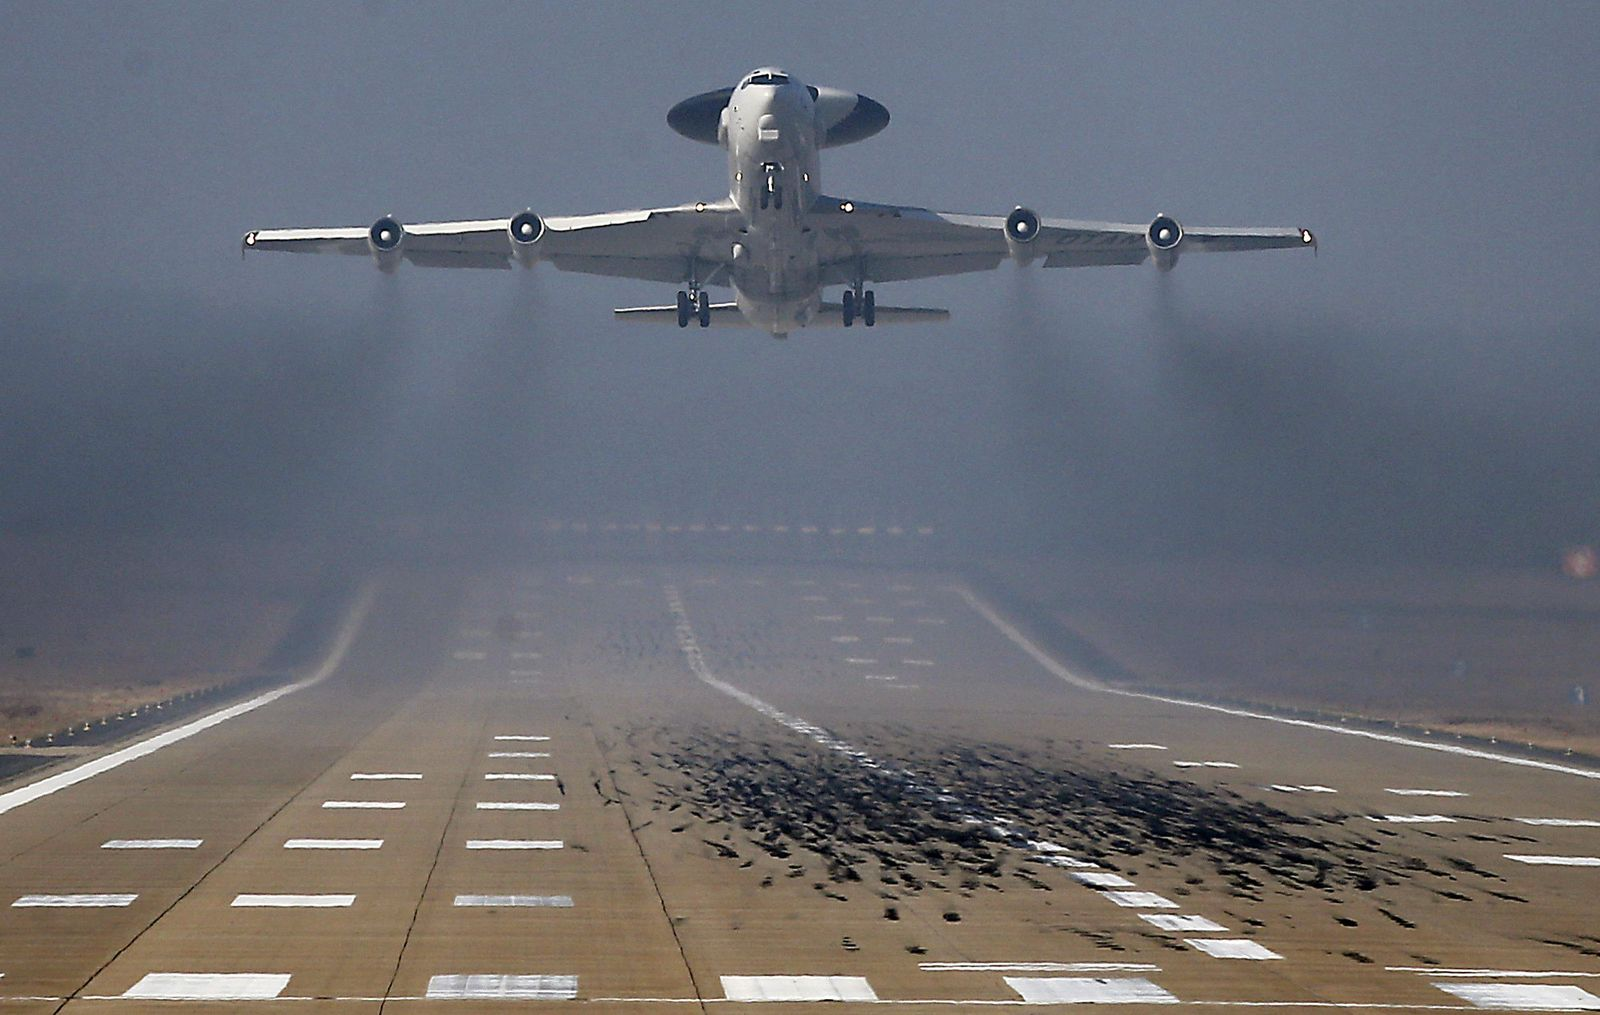 Nato / Awacs Flugzeug